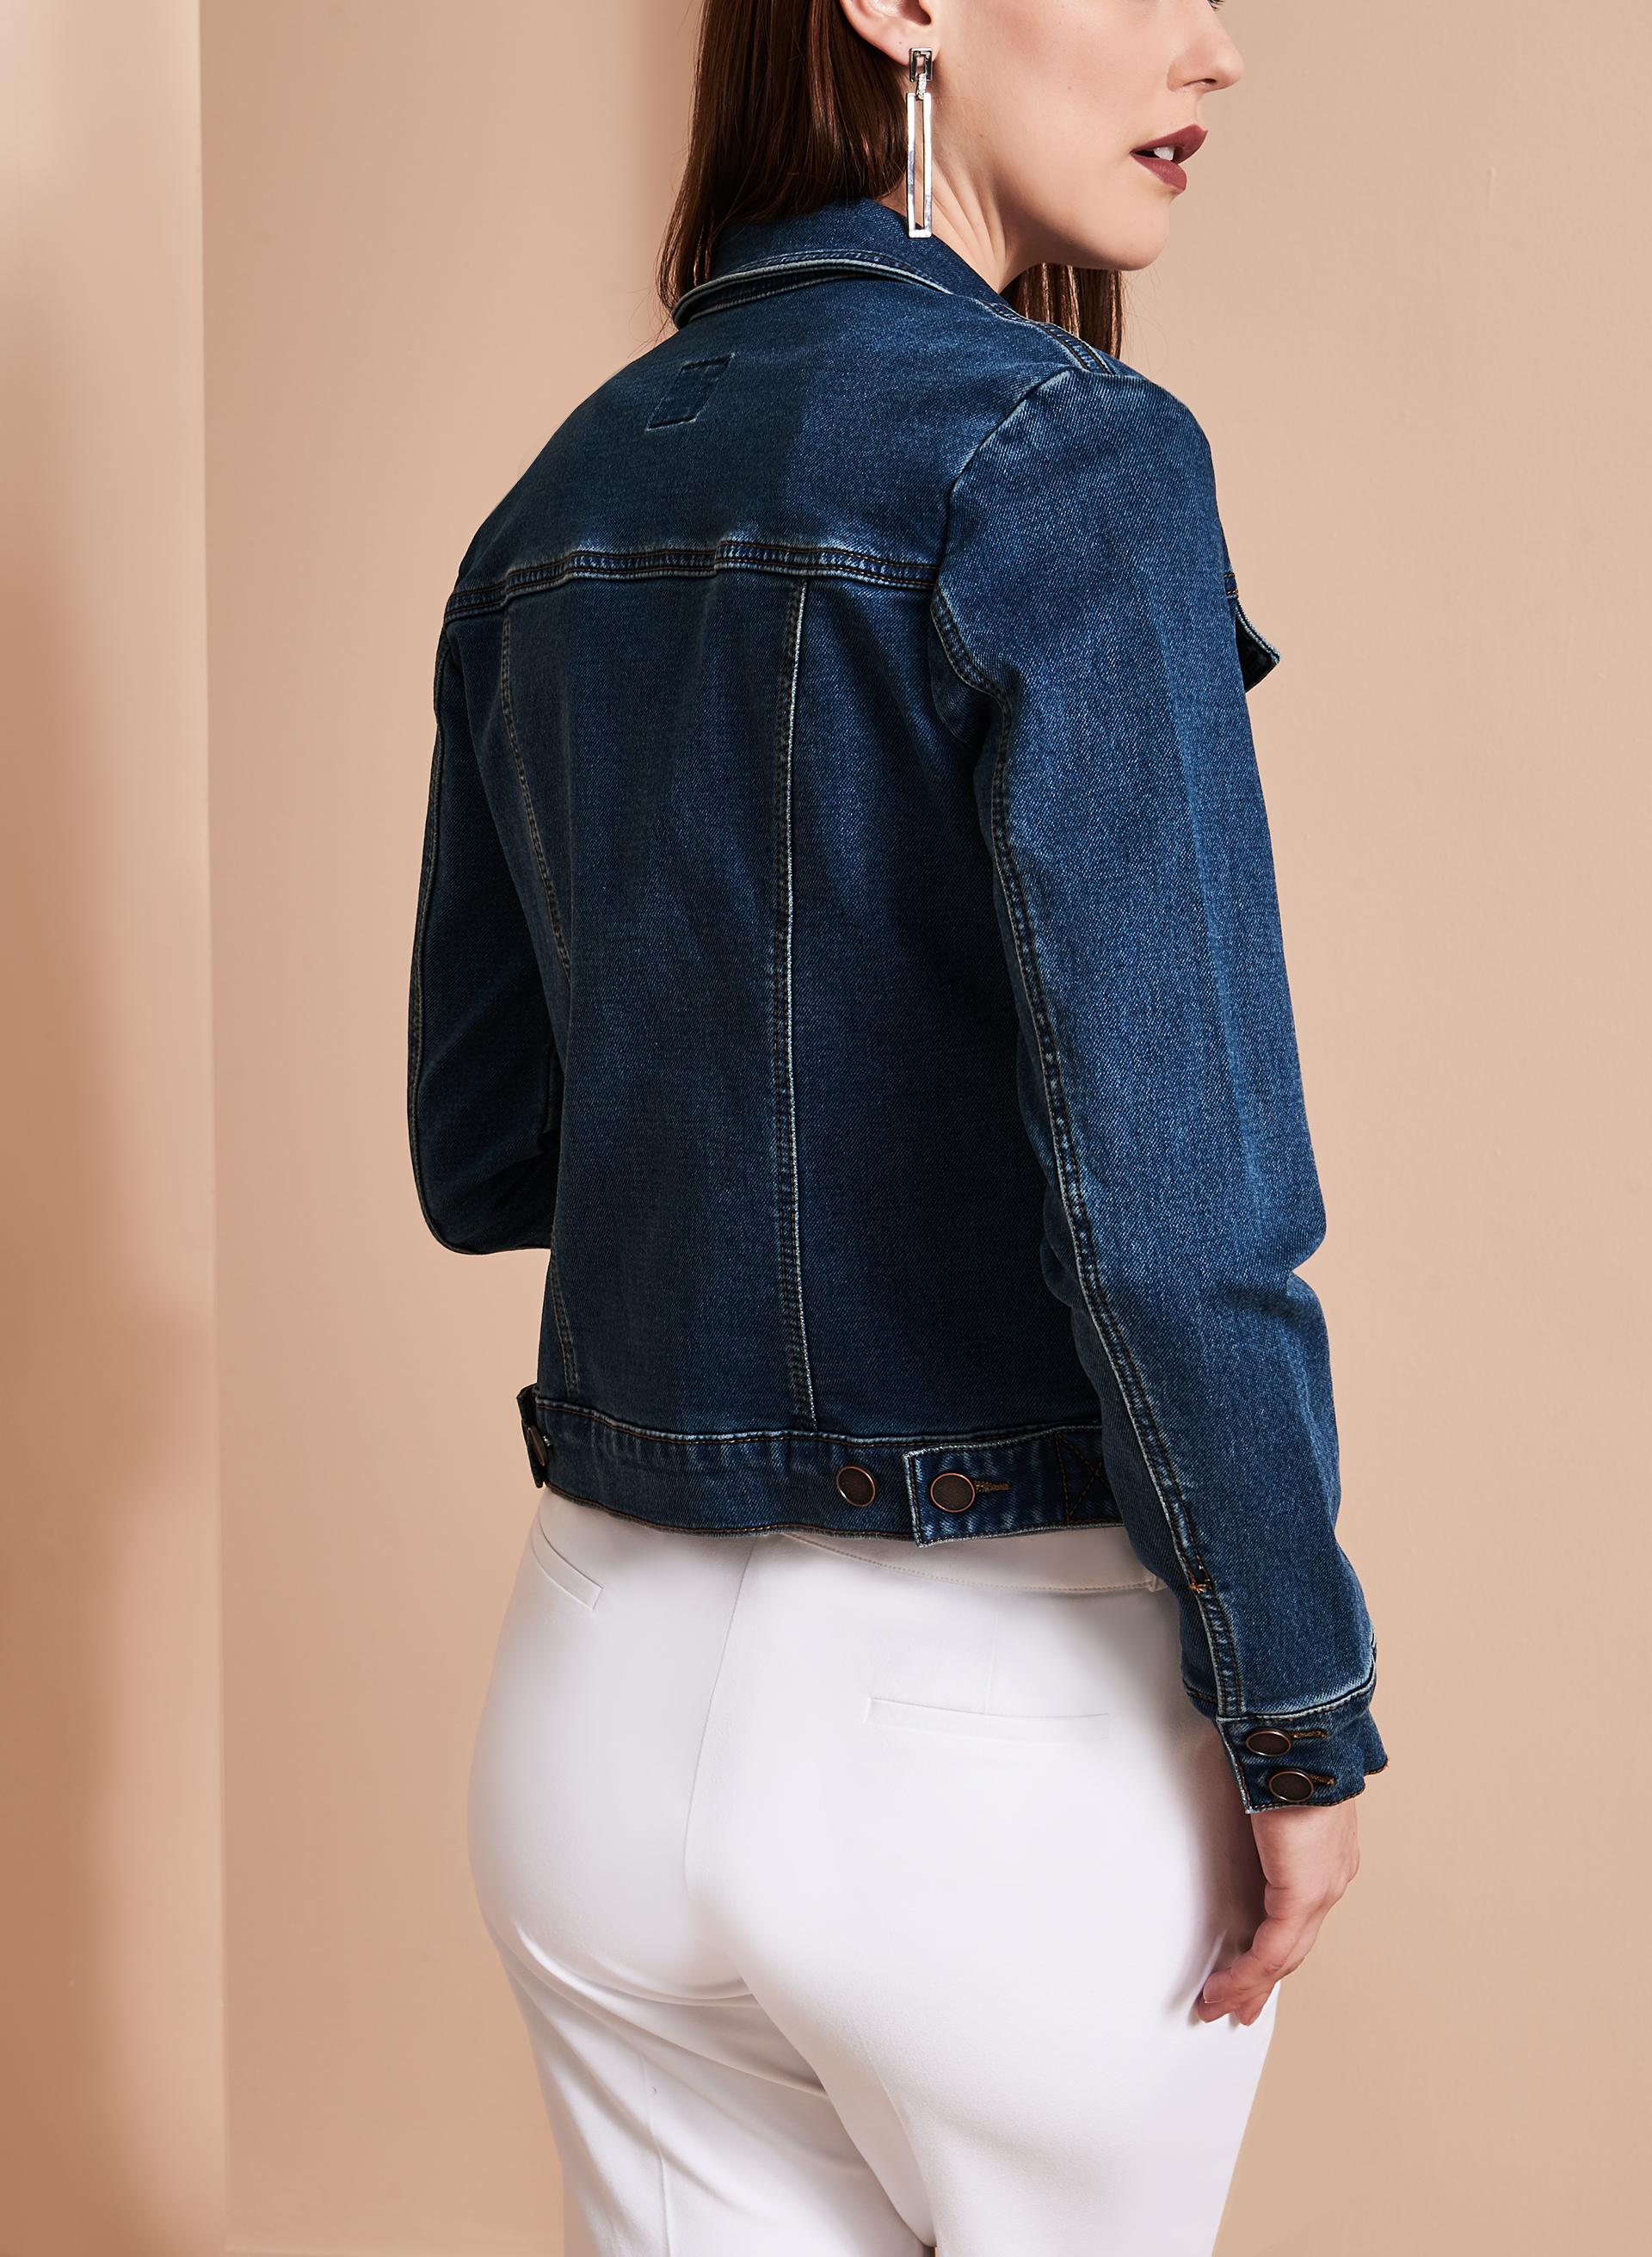 Free Knitting Pattern Cropped Jacket : Cropped Knit Jean Jacket FREE Shipping* Melanie Lyne